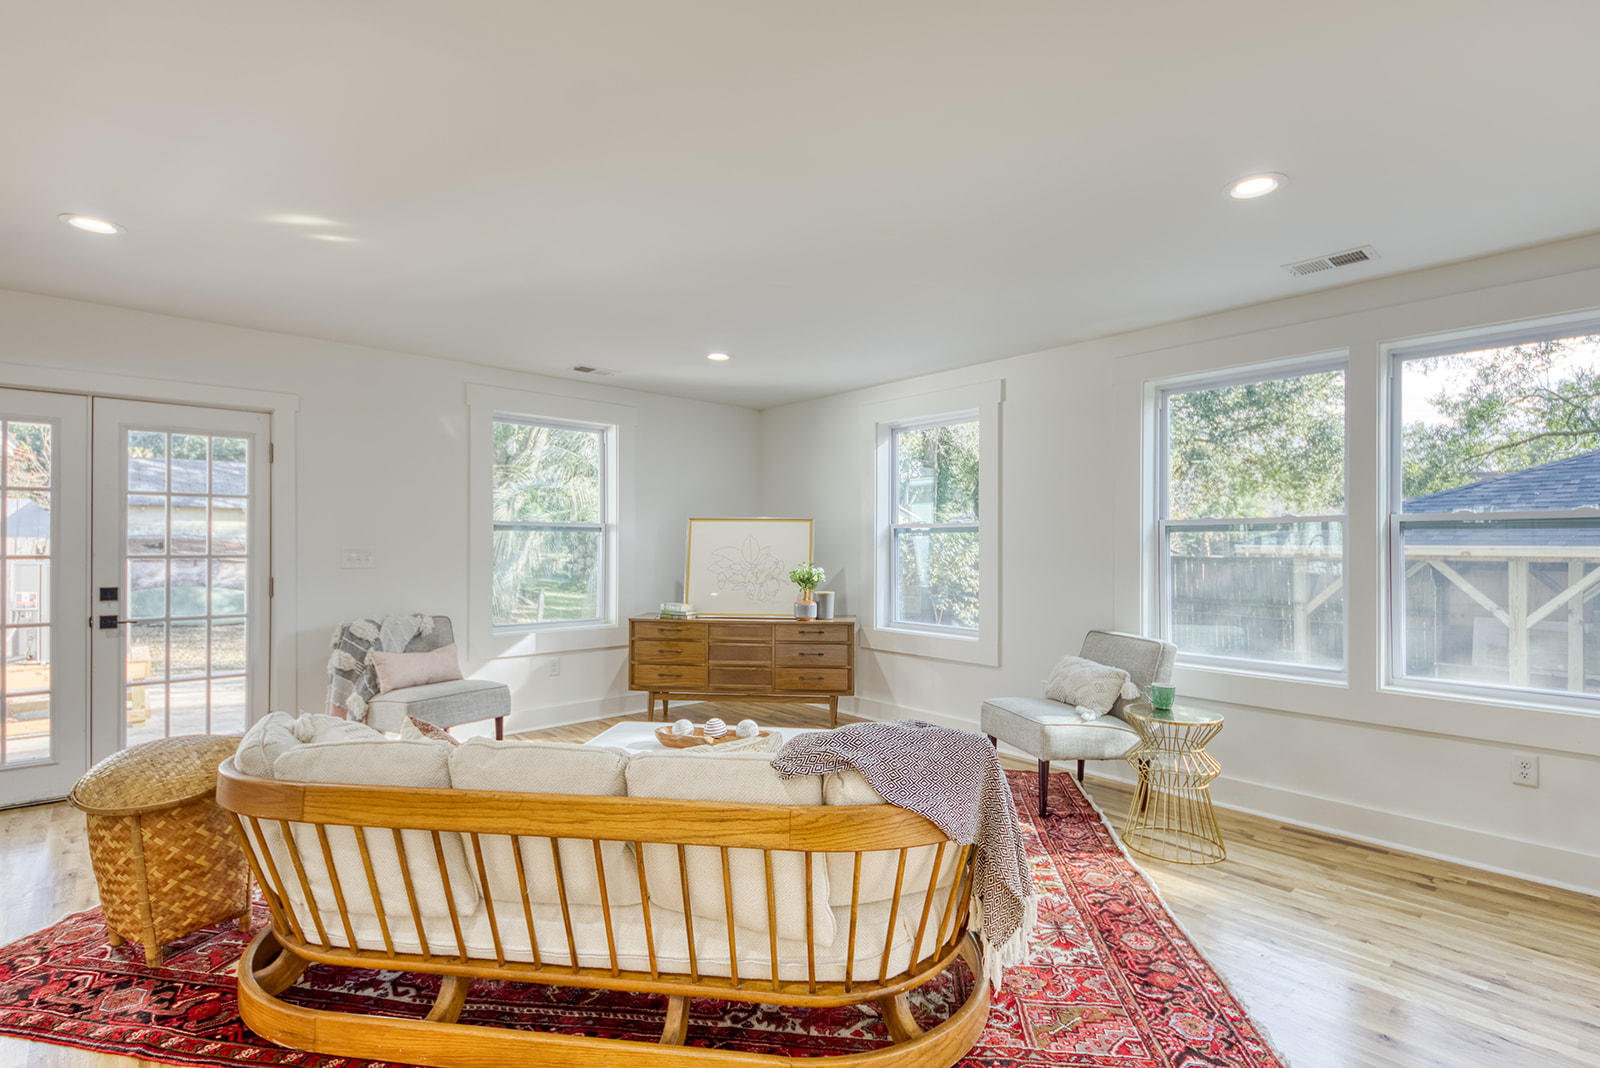 Bay View Acres Homes For Sale - 265 Coleman, Mount Pleasant, SC - 28